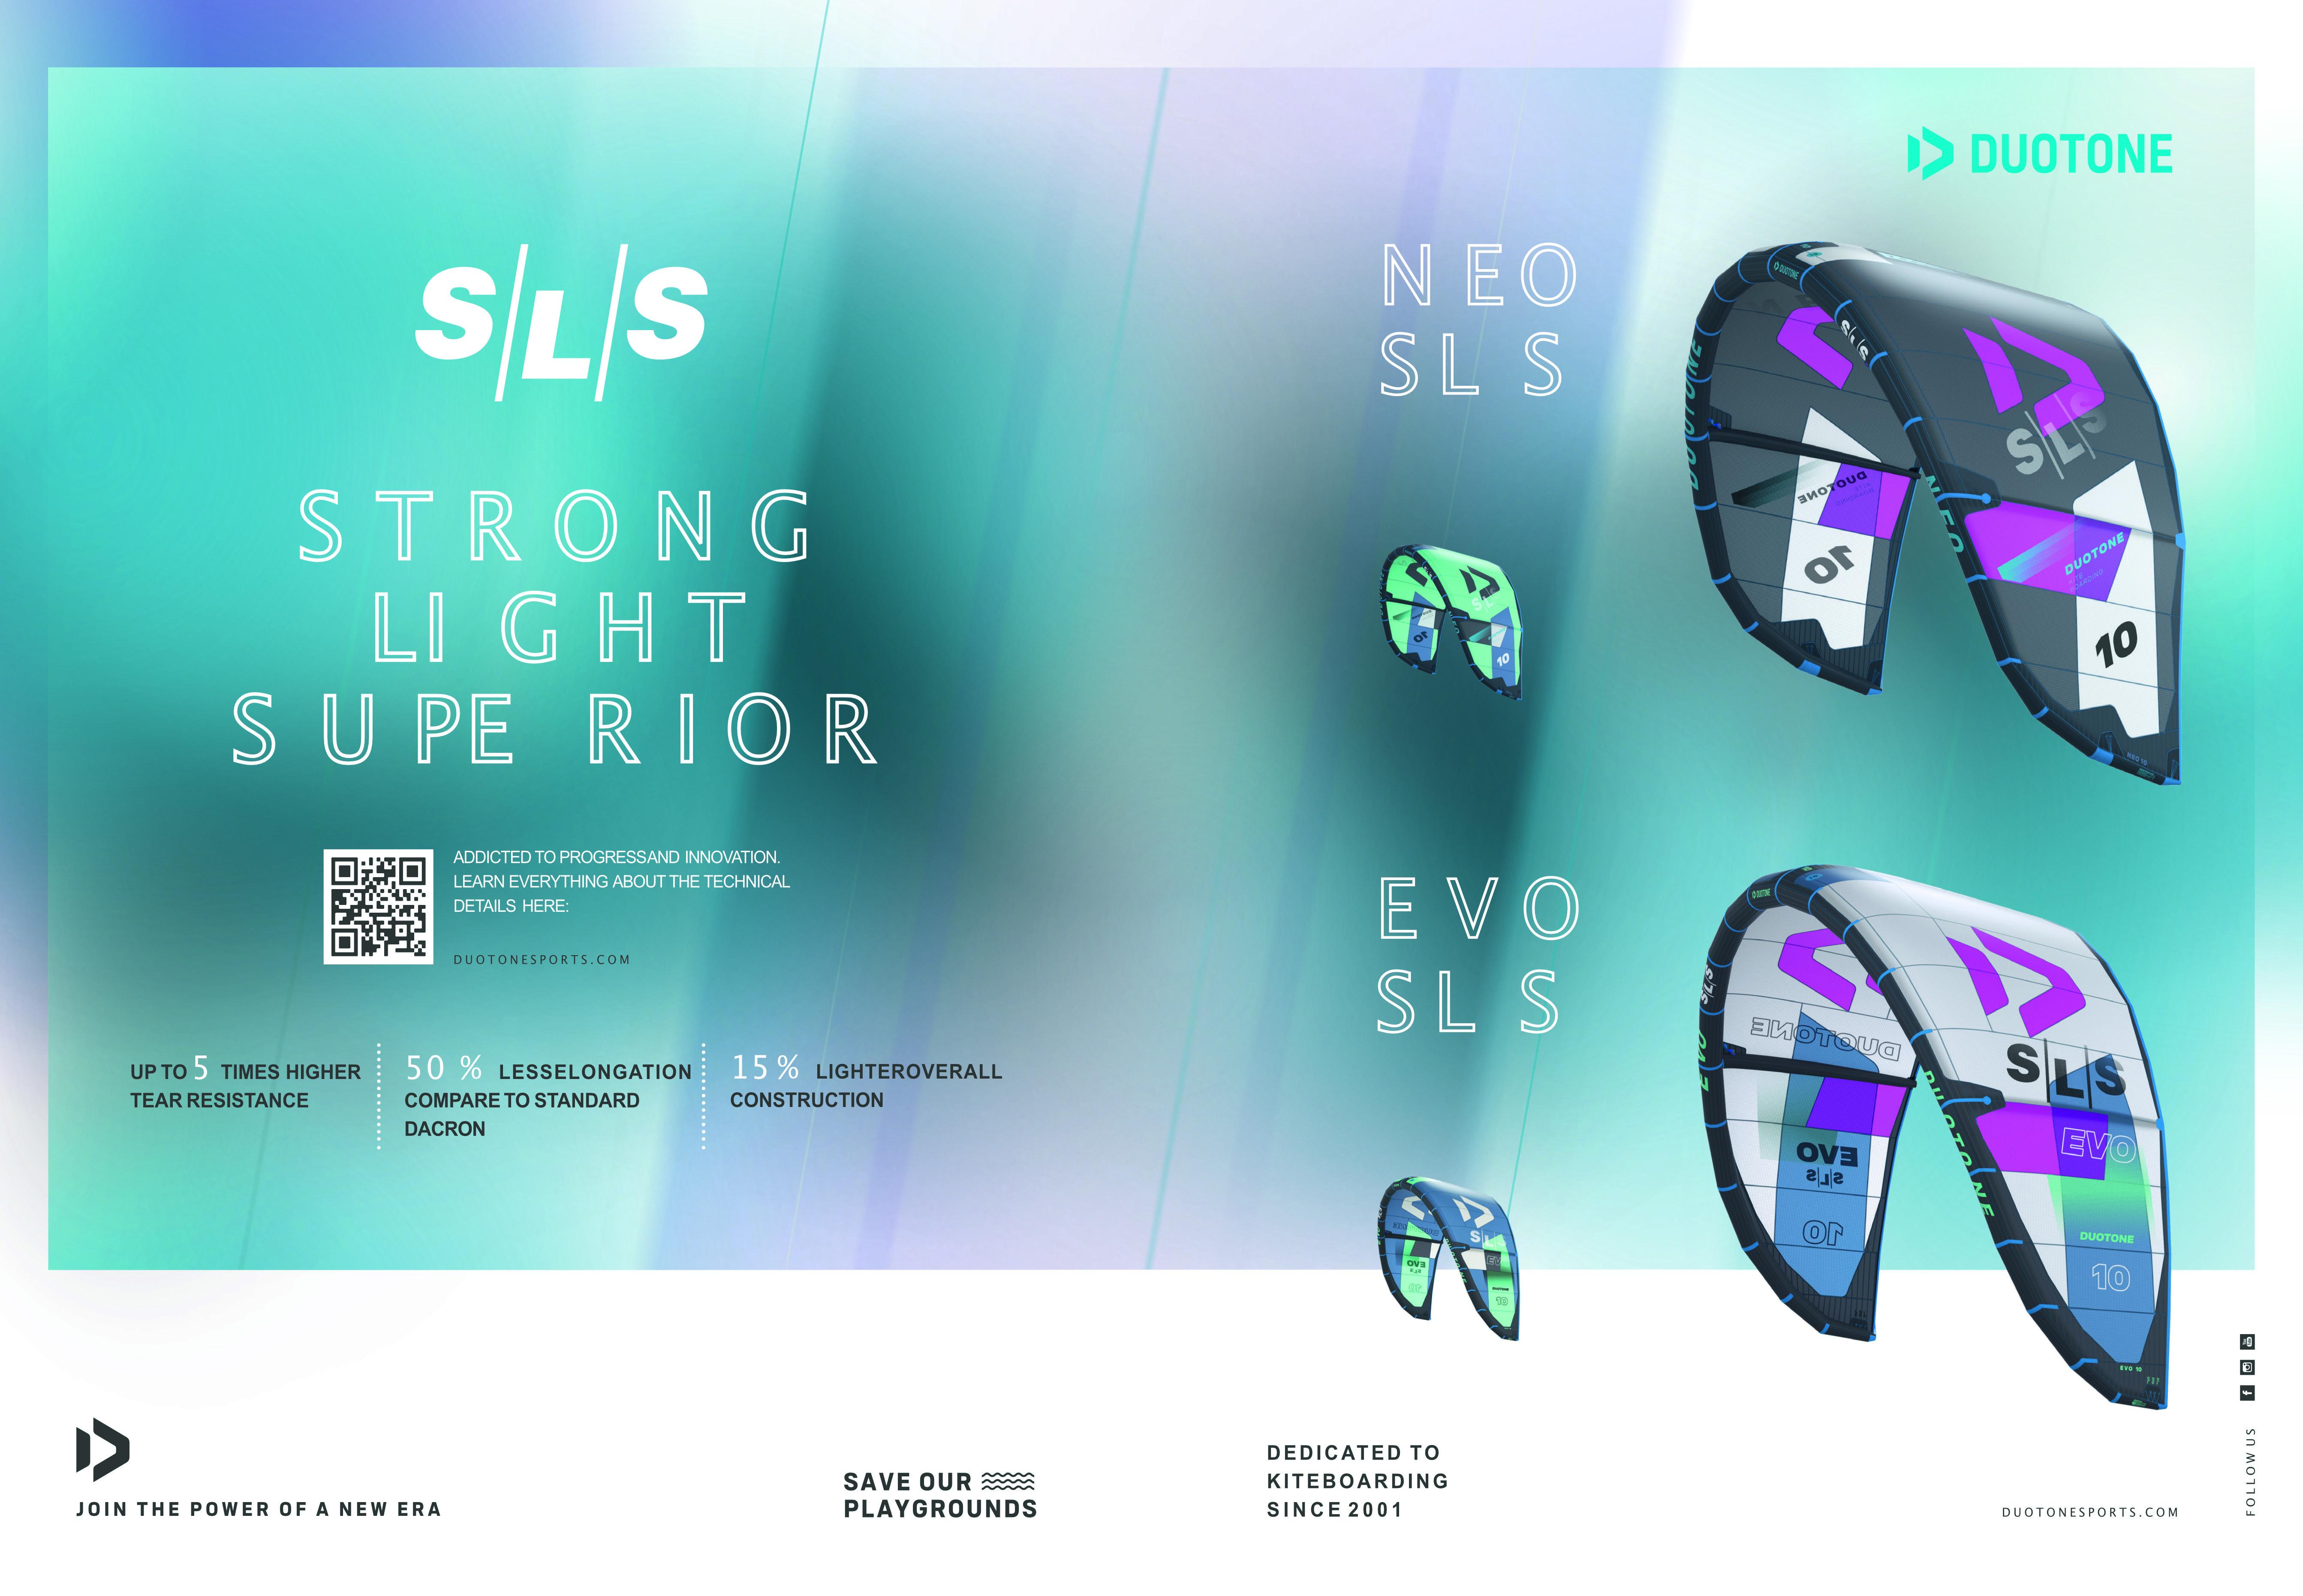 DTK_SLS_NEO_EVO_2020_215x280_RZ